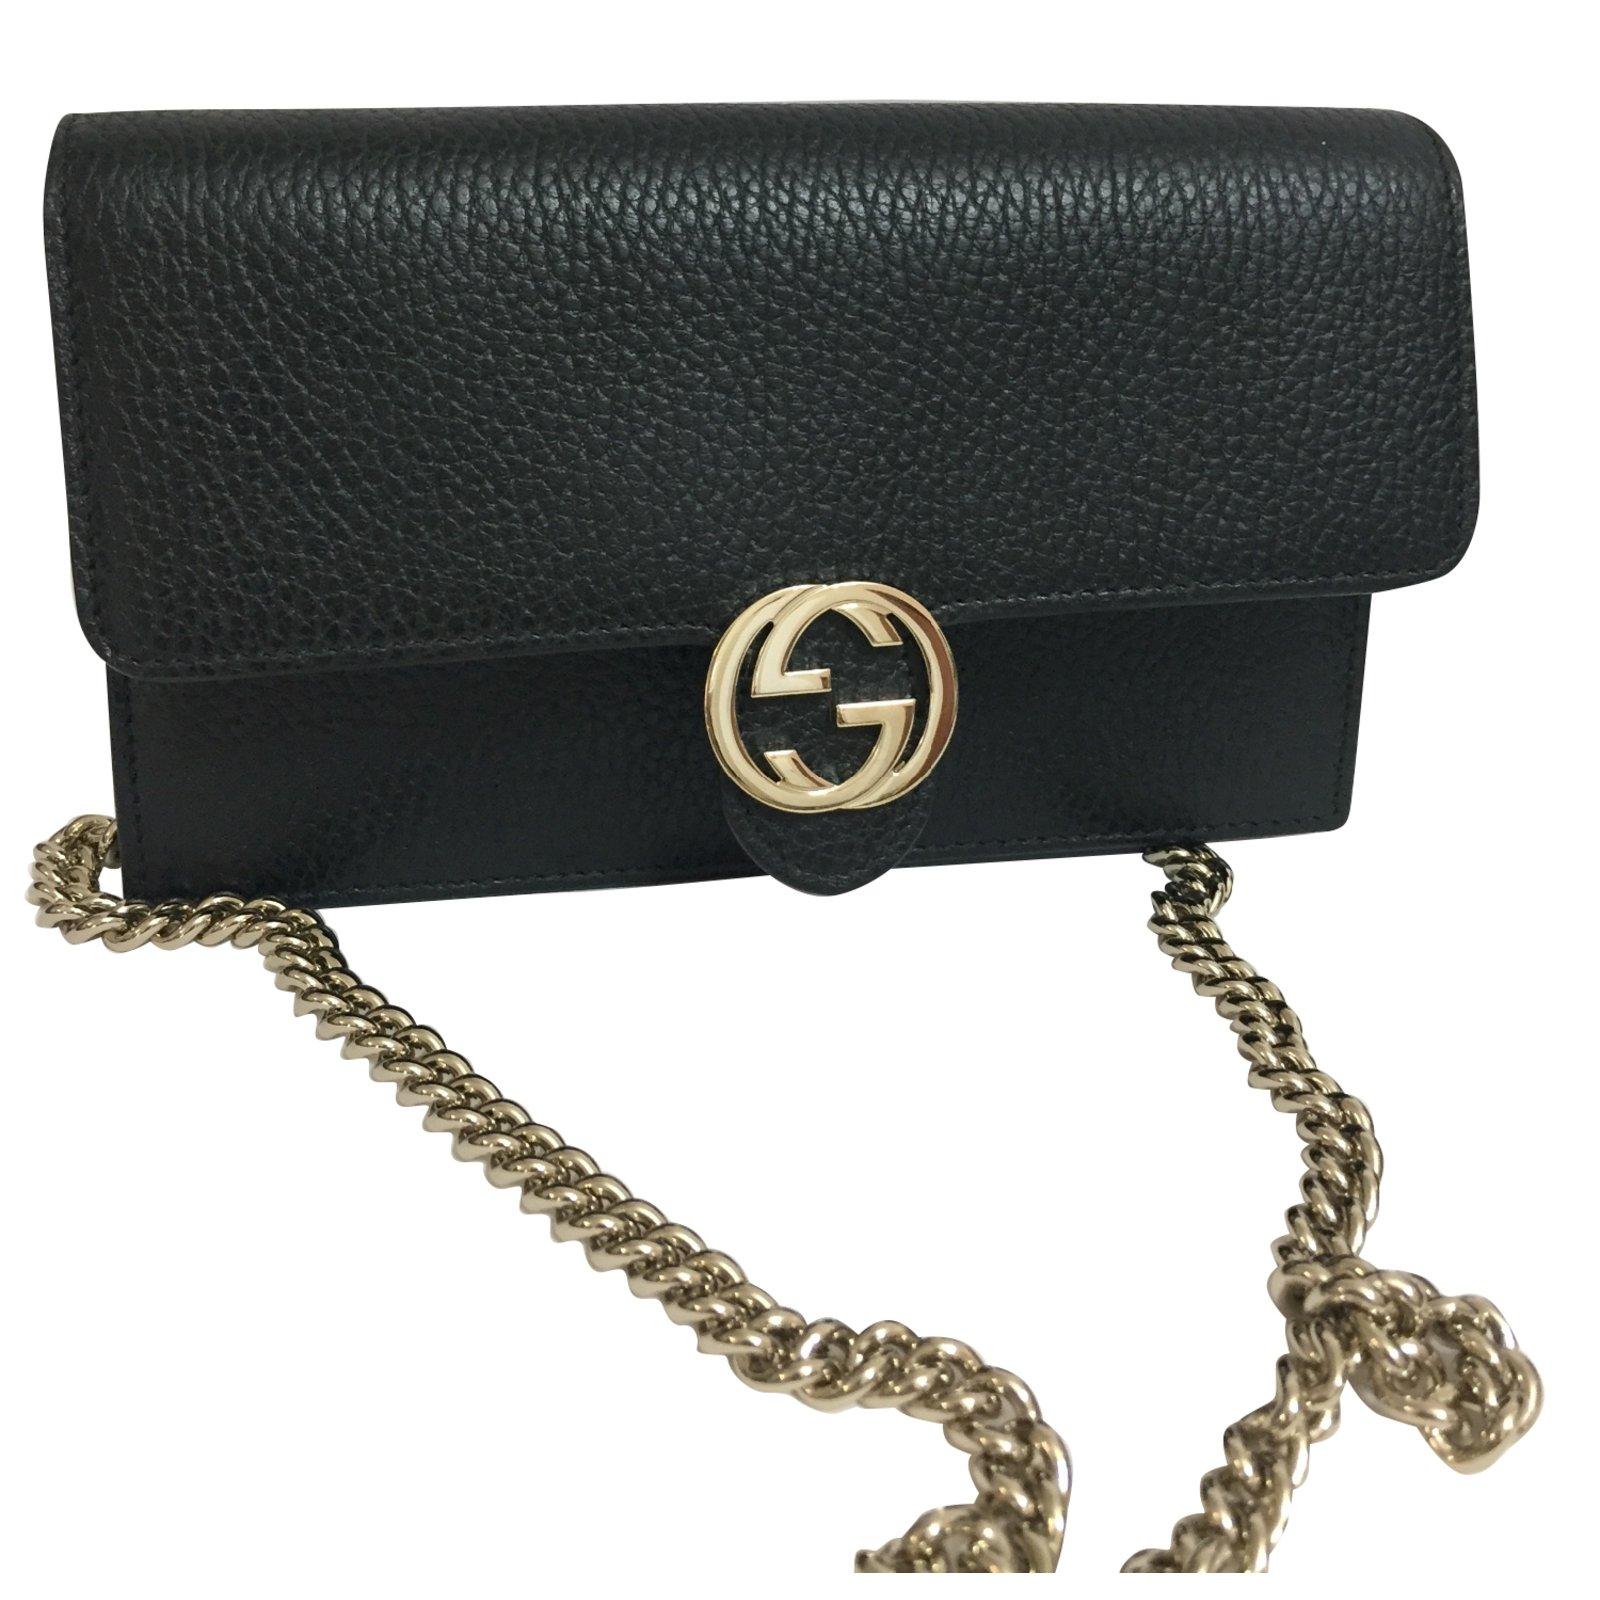 54075e362ce0 Gucci Wallet On Chain Clutch Bags Leather Black Ref 67006 Joli Closet